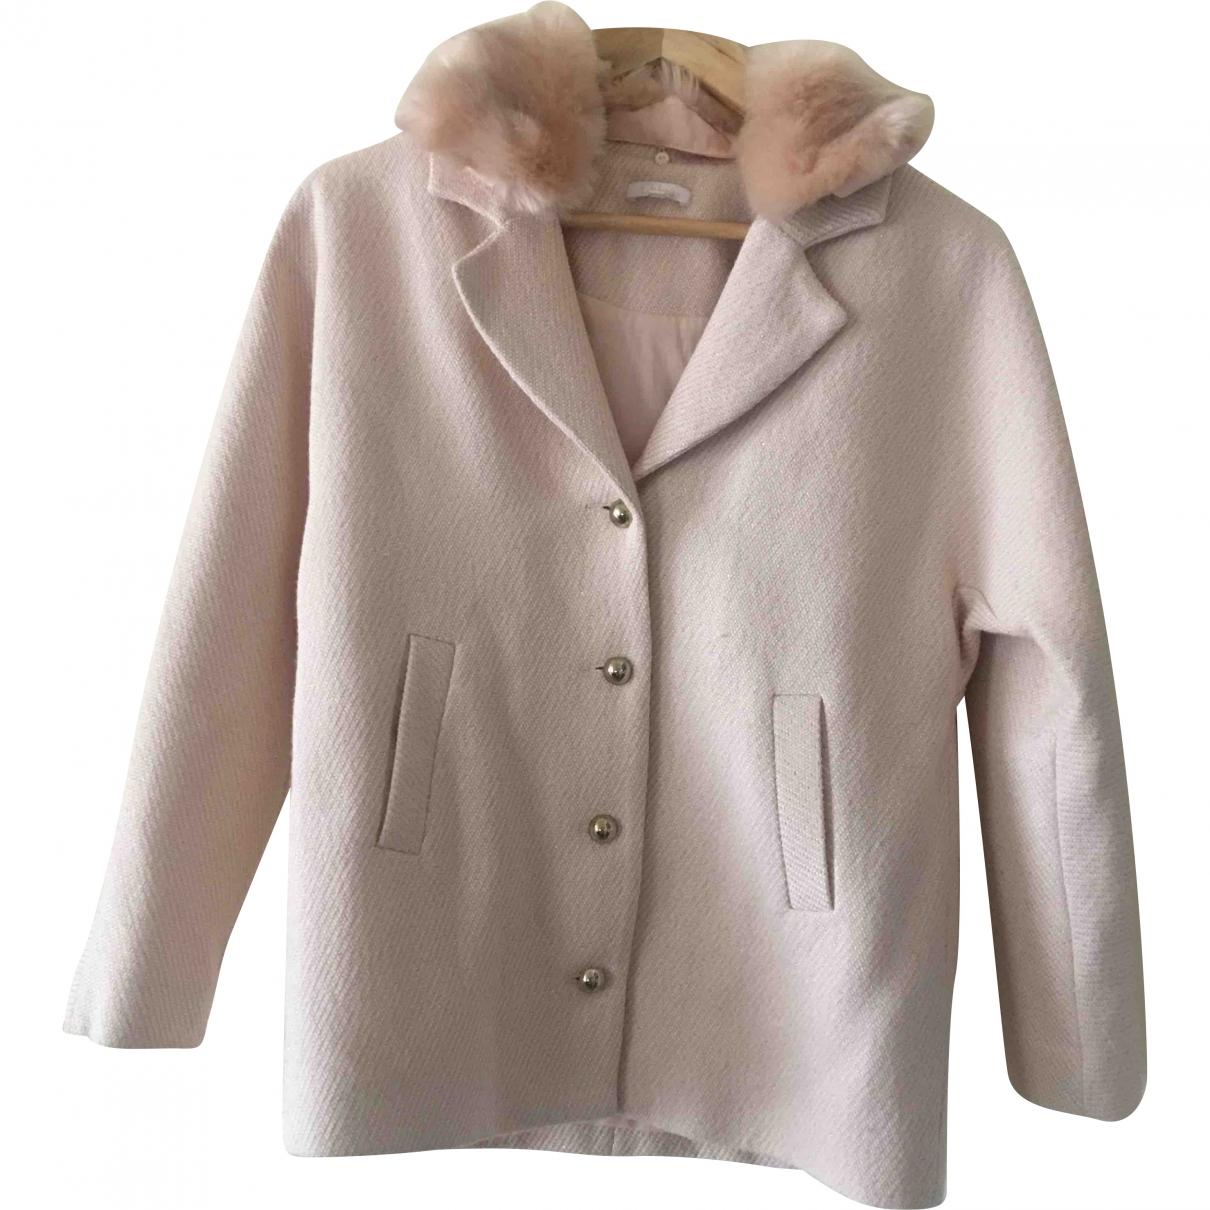 Chloé \N Pink jacket & coat for Kids 12 months - up to 74cm FR